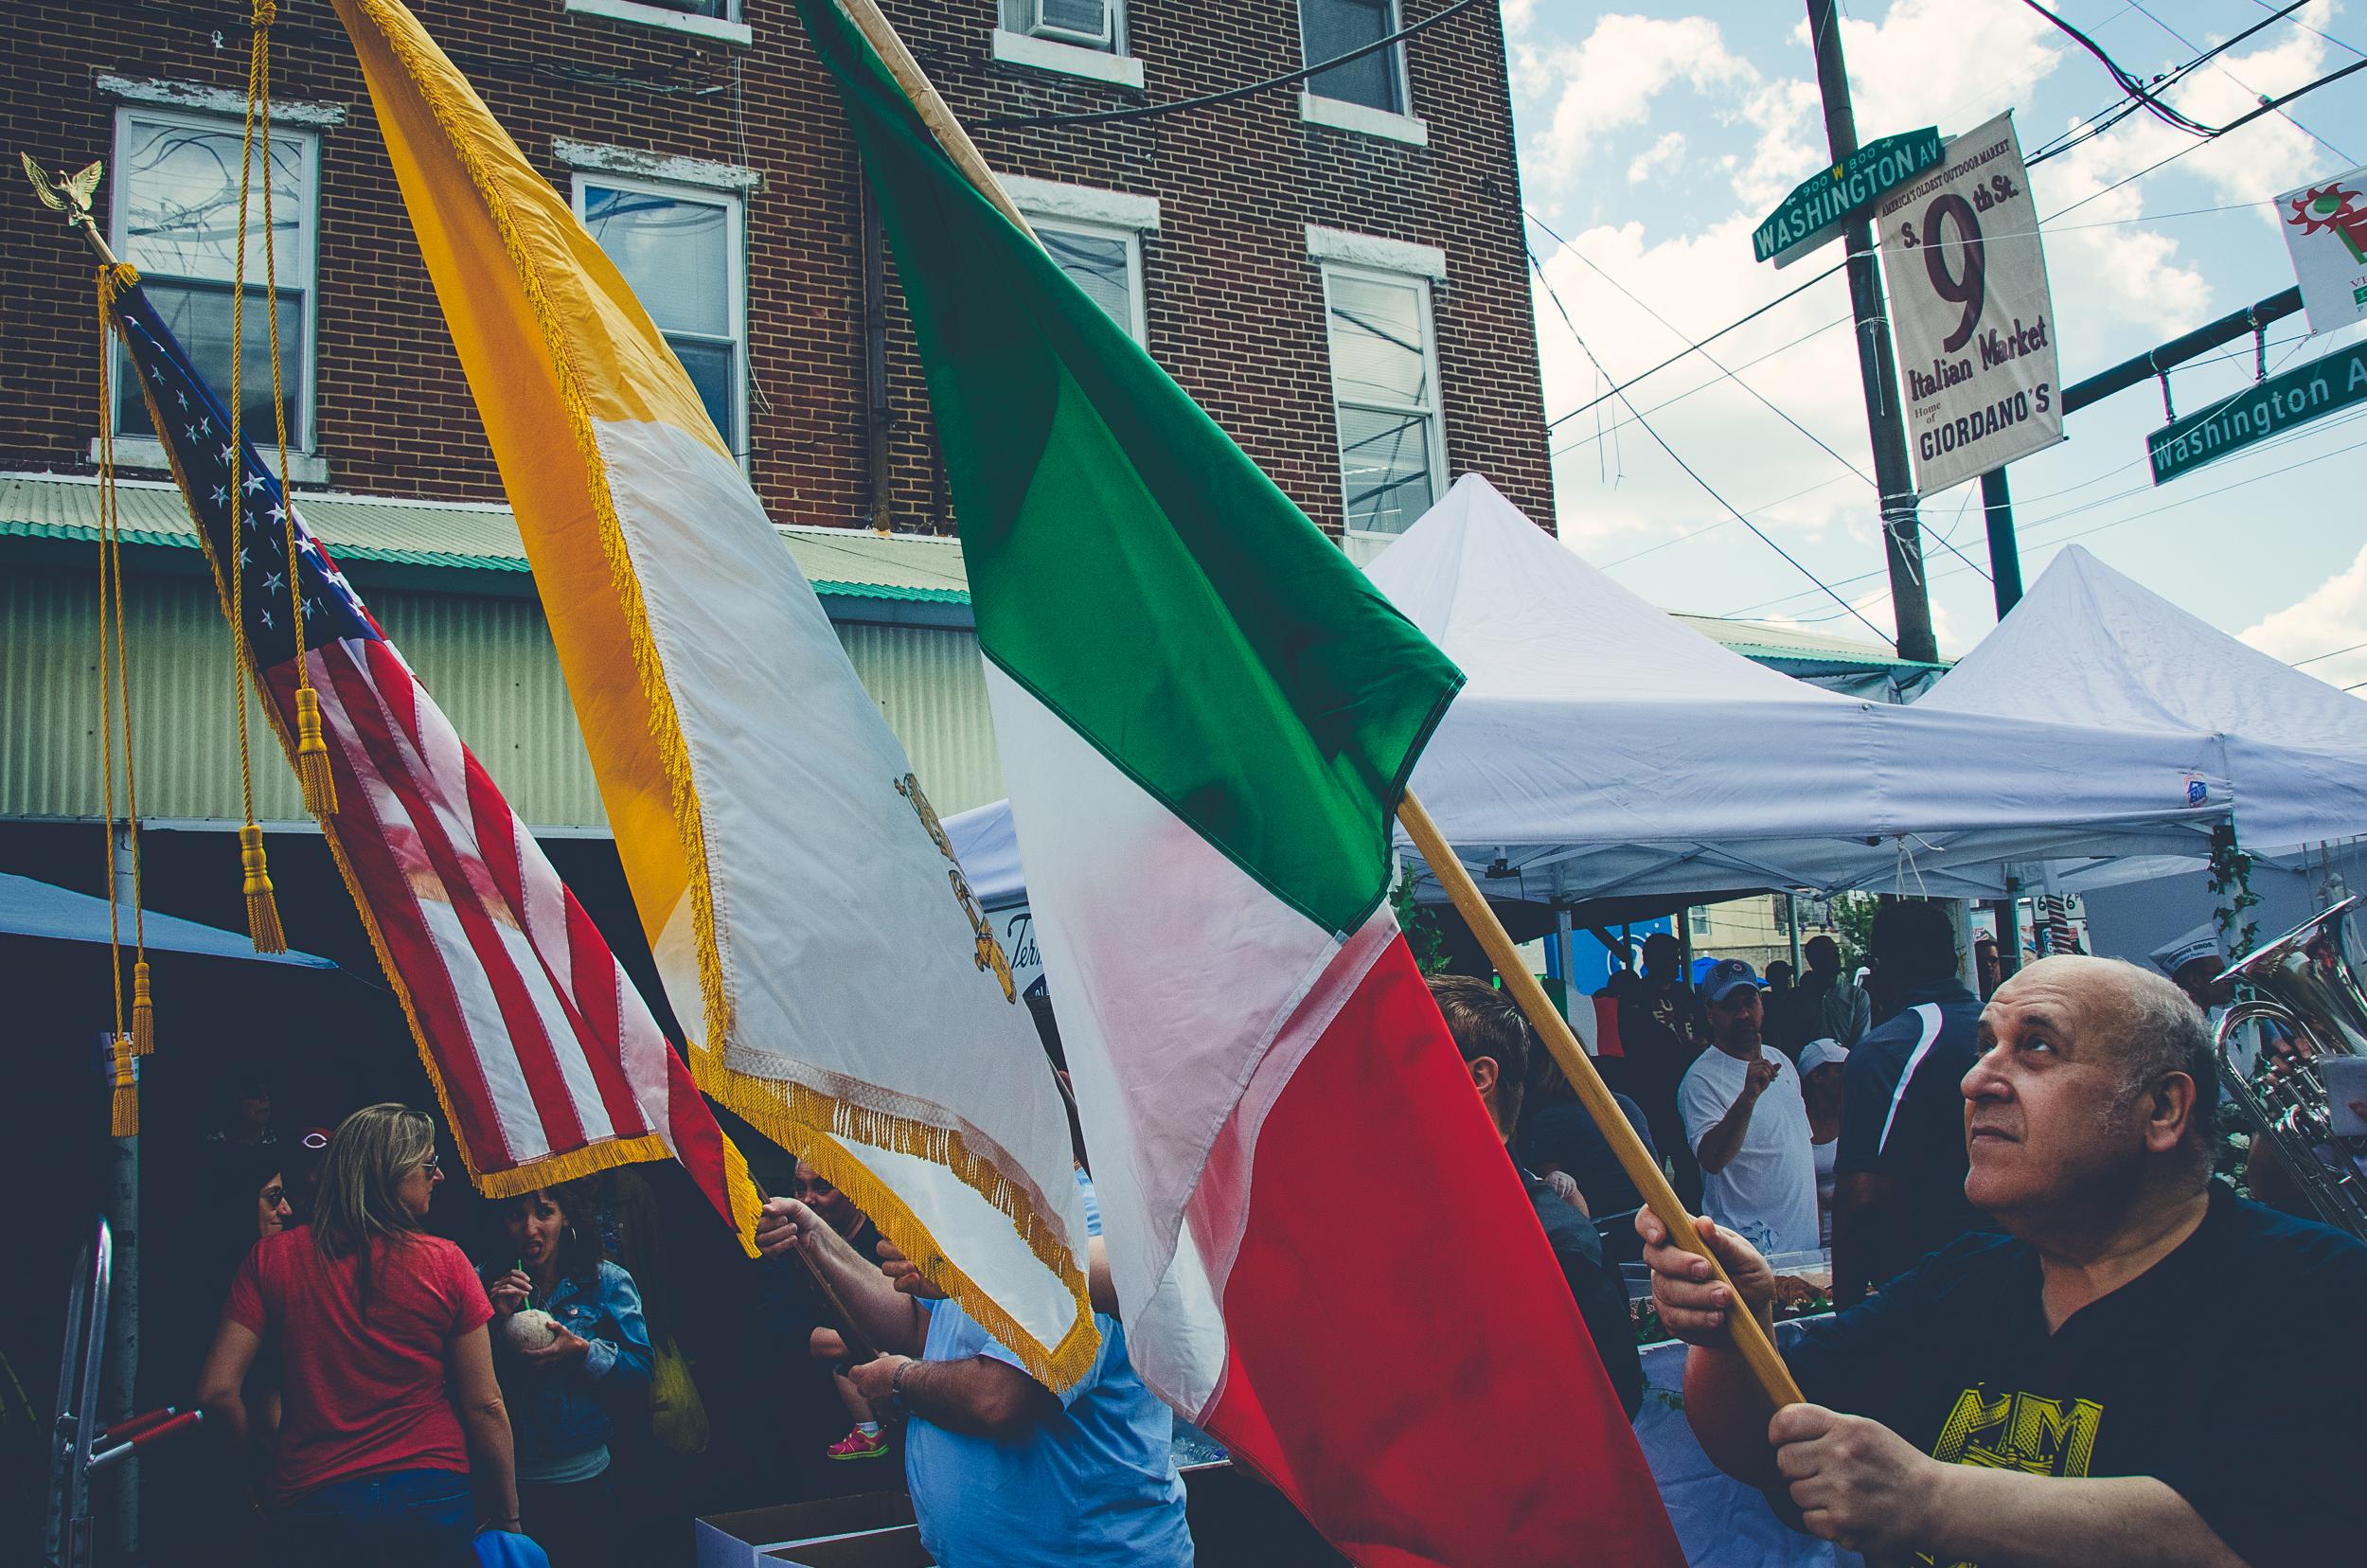 italian market festival, procession of the saints, italian market philadelphia, visit philly, philadelphia food, food scene philly, philadelphia churches, philadelphia religion, traditions, italian food philadelphia